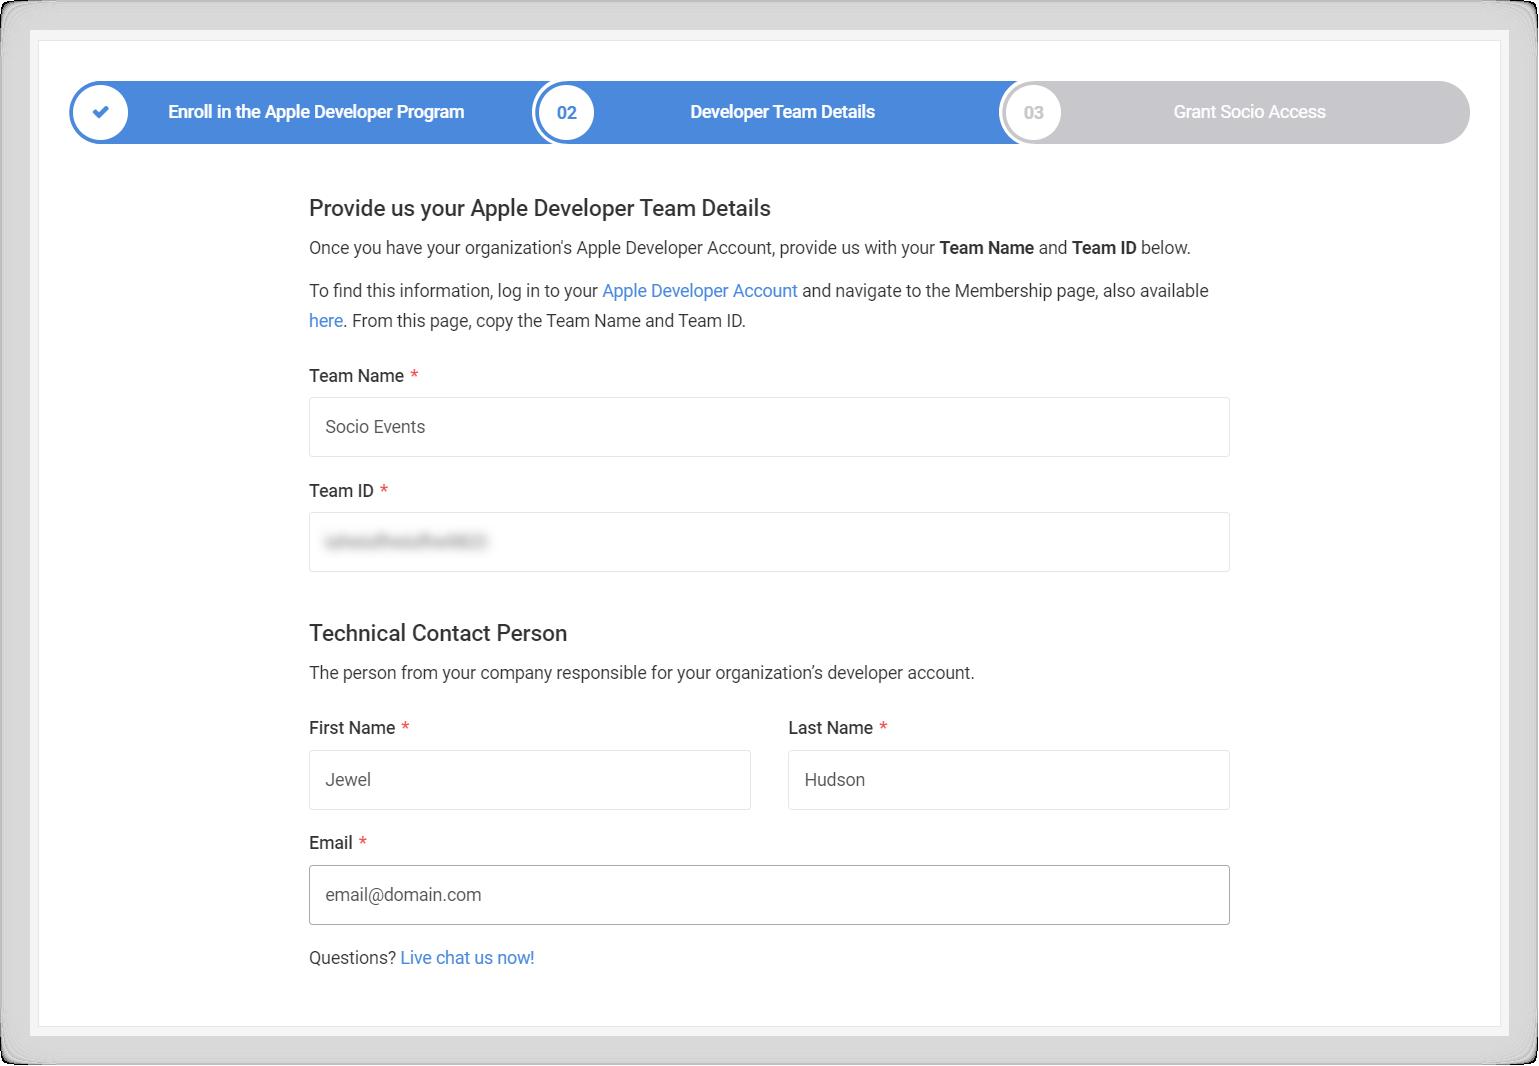 Screenshot of the Developer Team Details step.